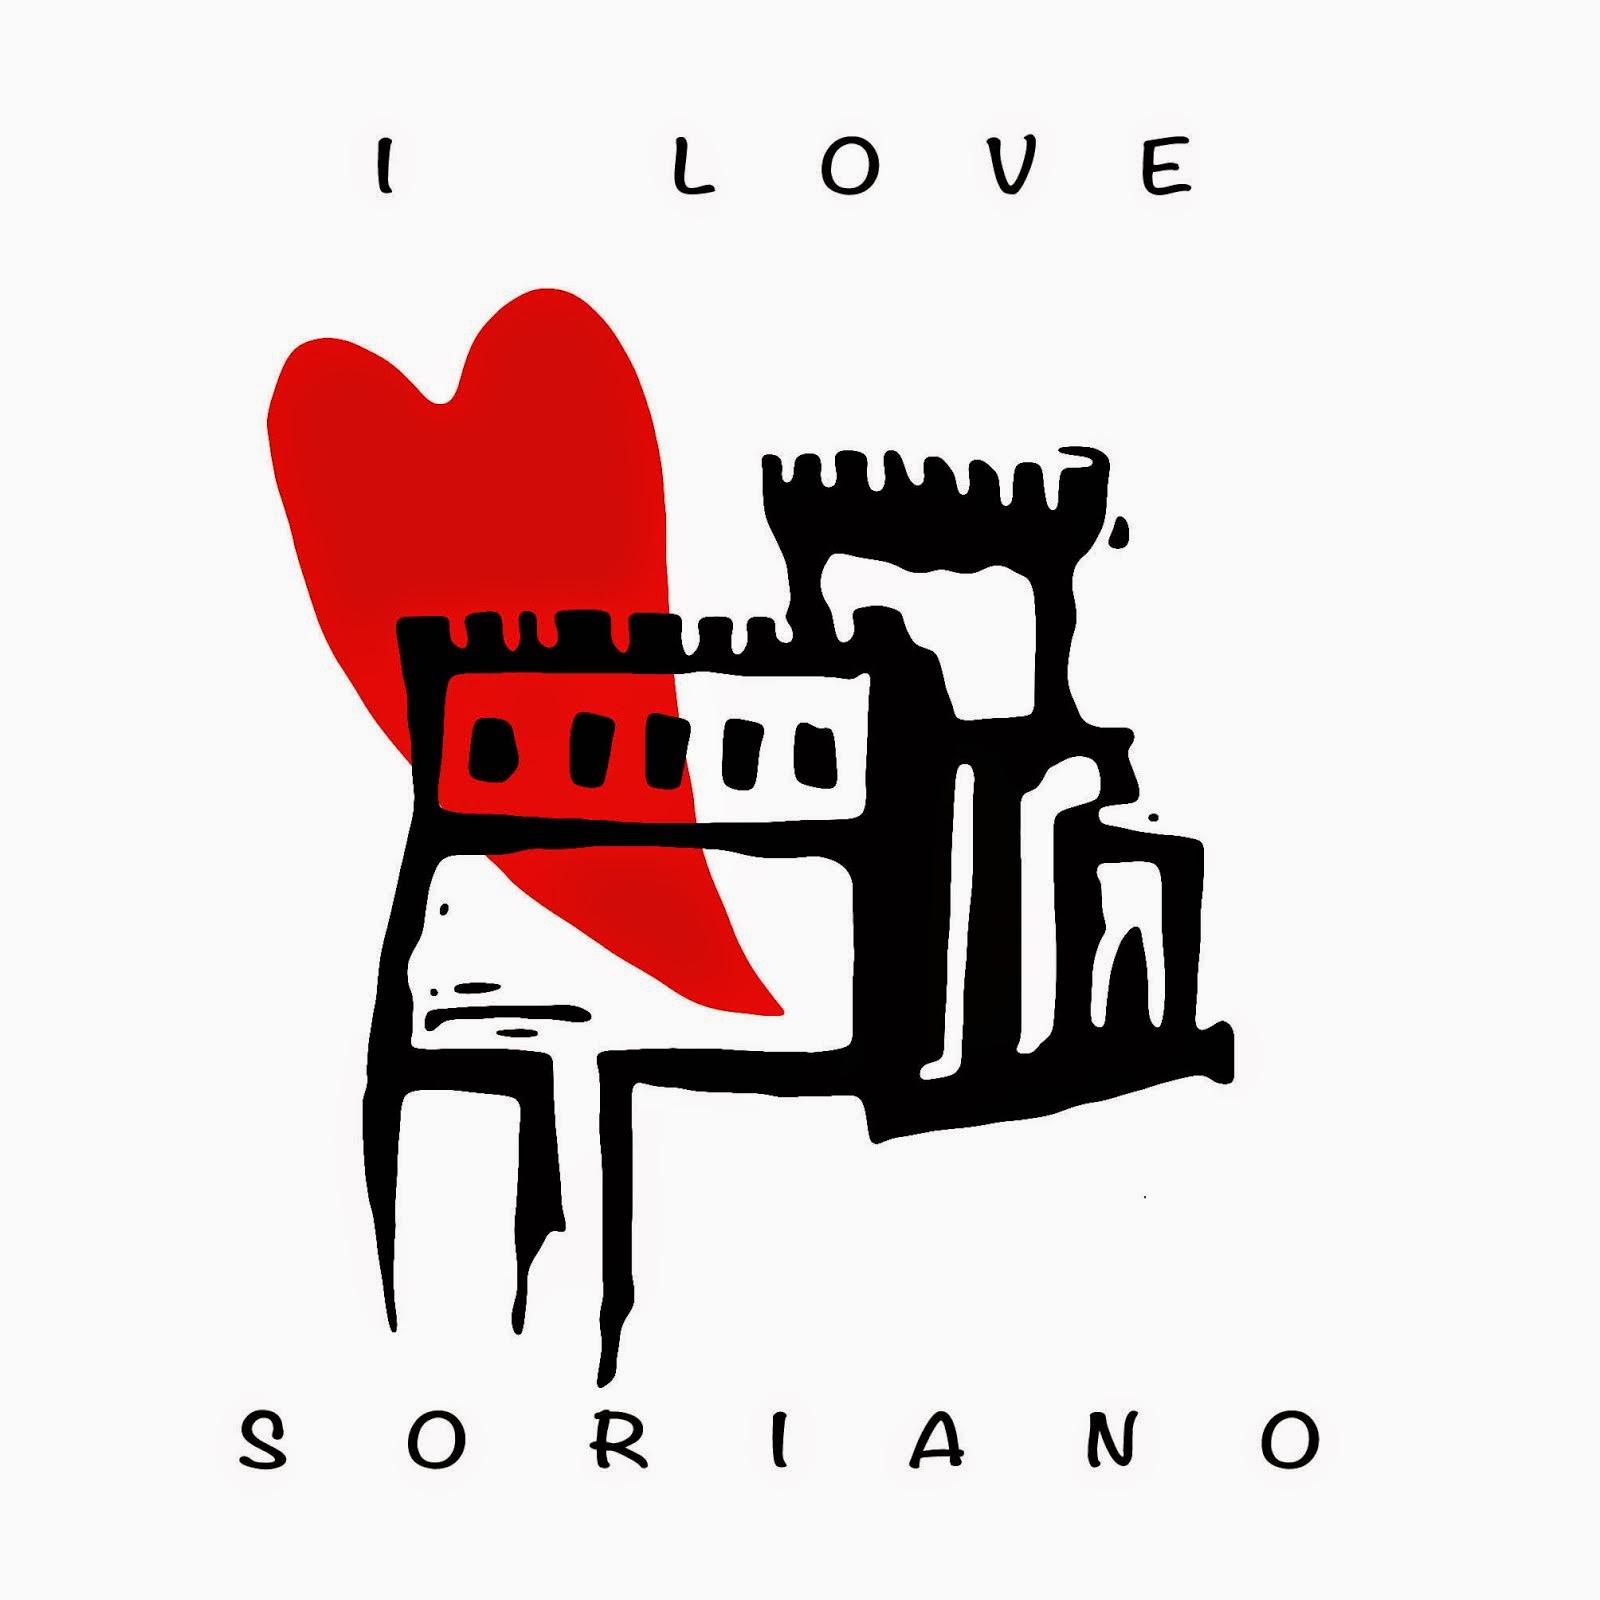 I LOVE SORIANO